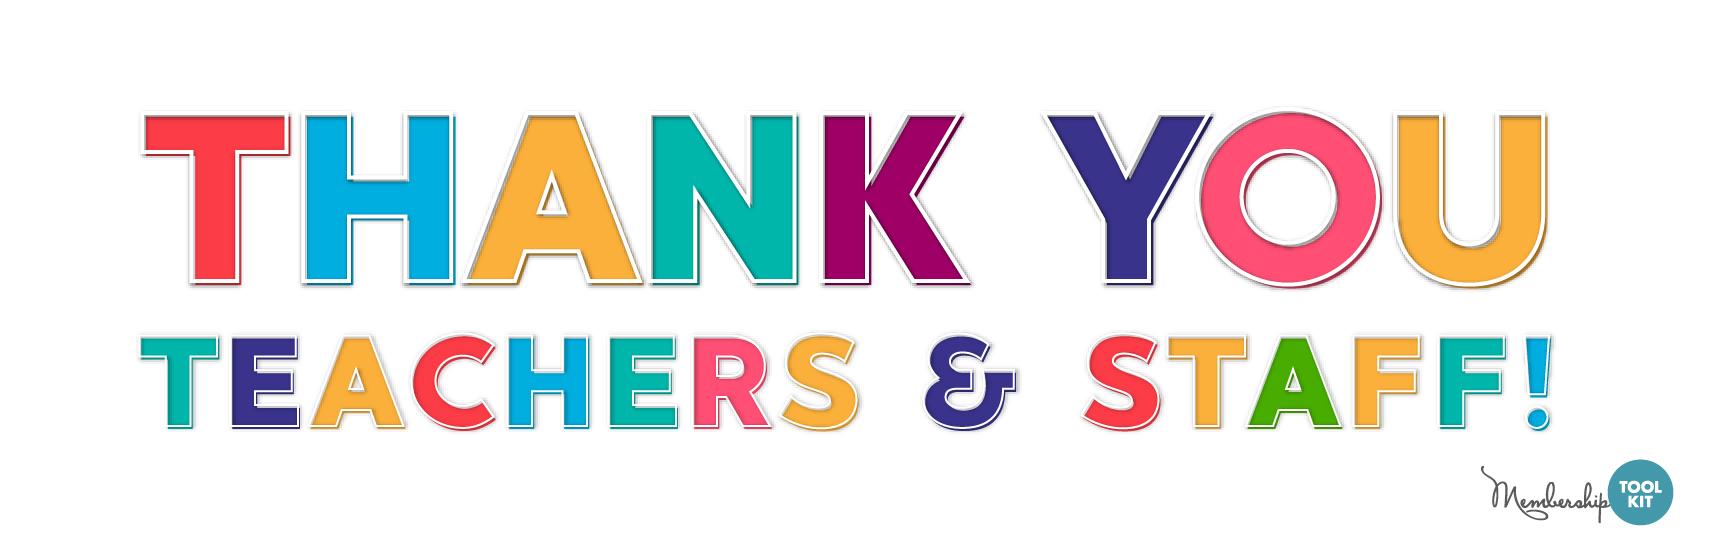 2021 Teacher Appreciation Week